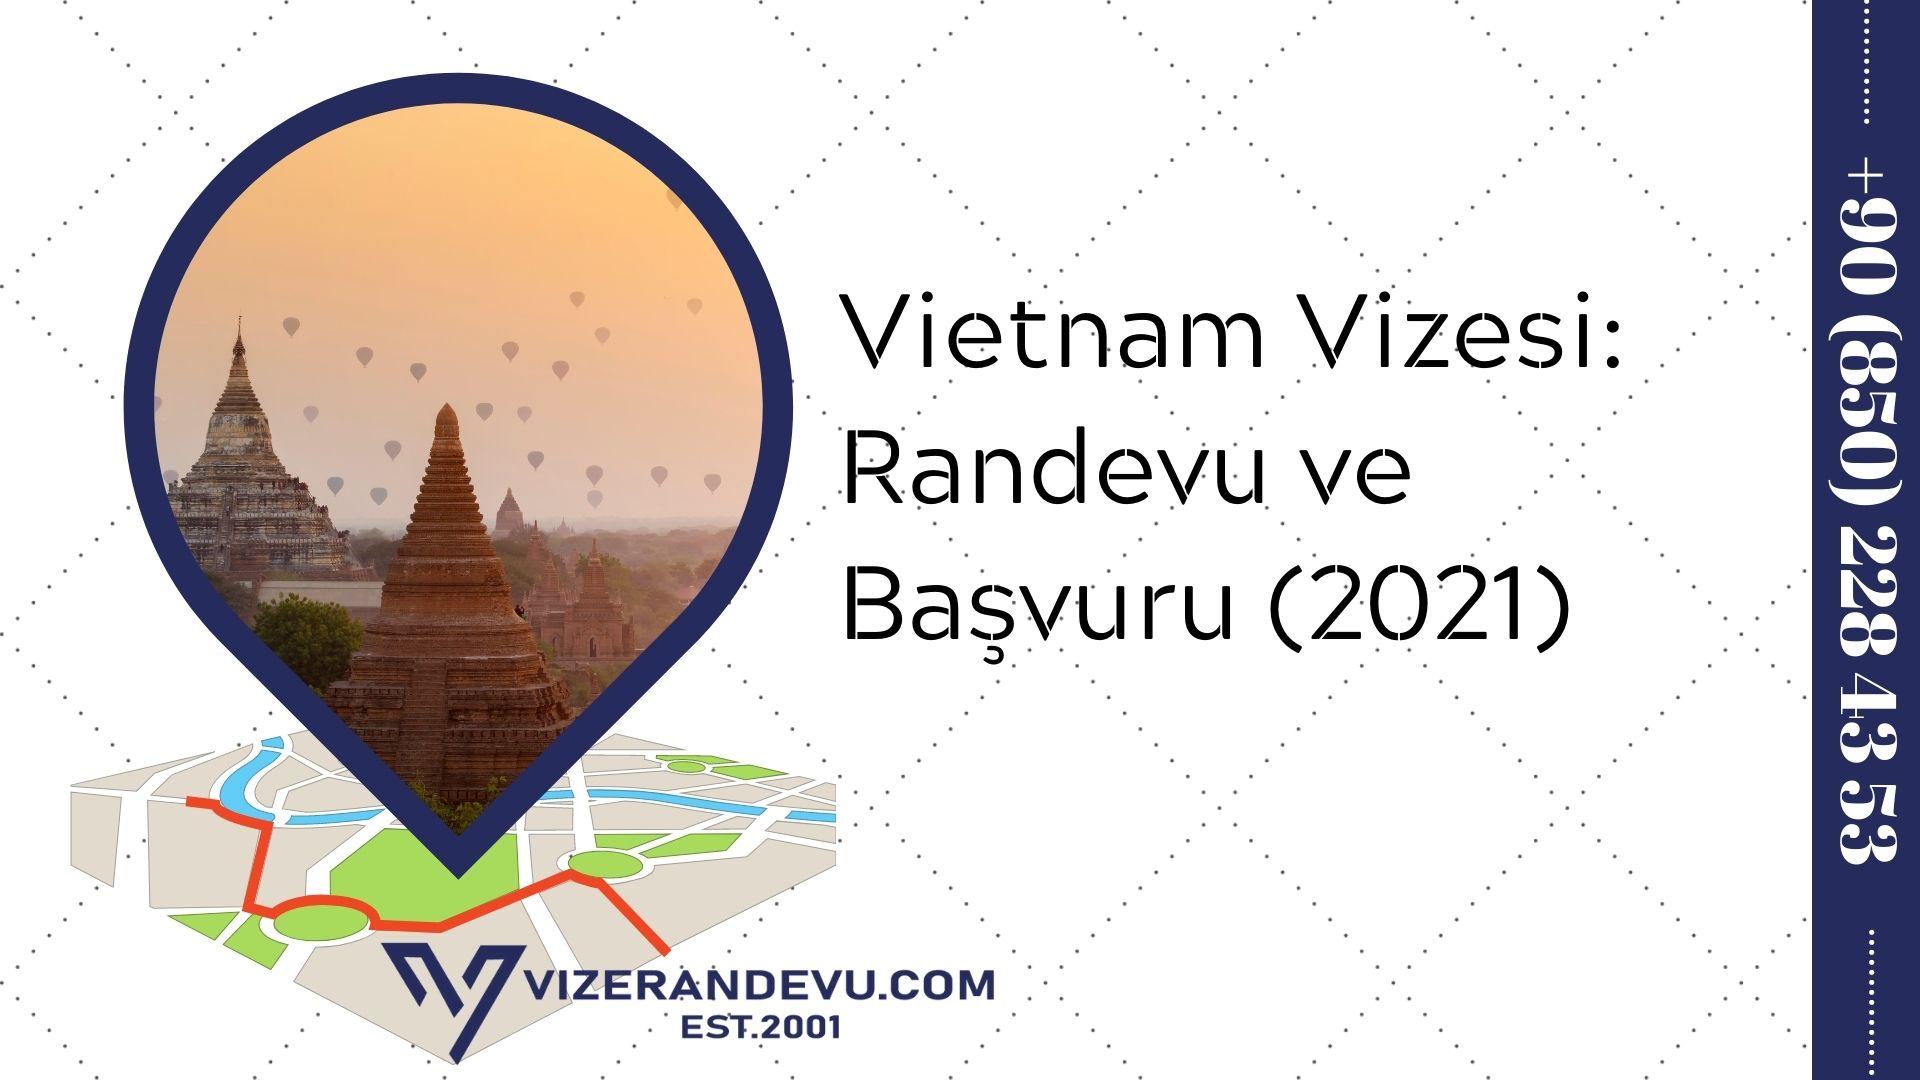 Vietnam Vizesi: Randevu ve Başvuru (2021)